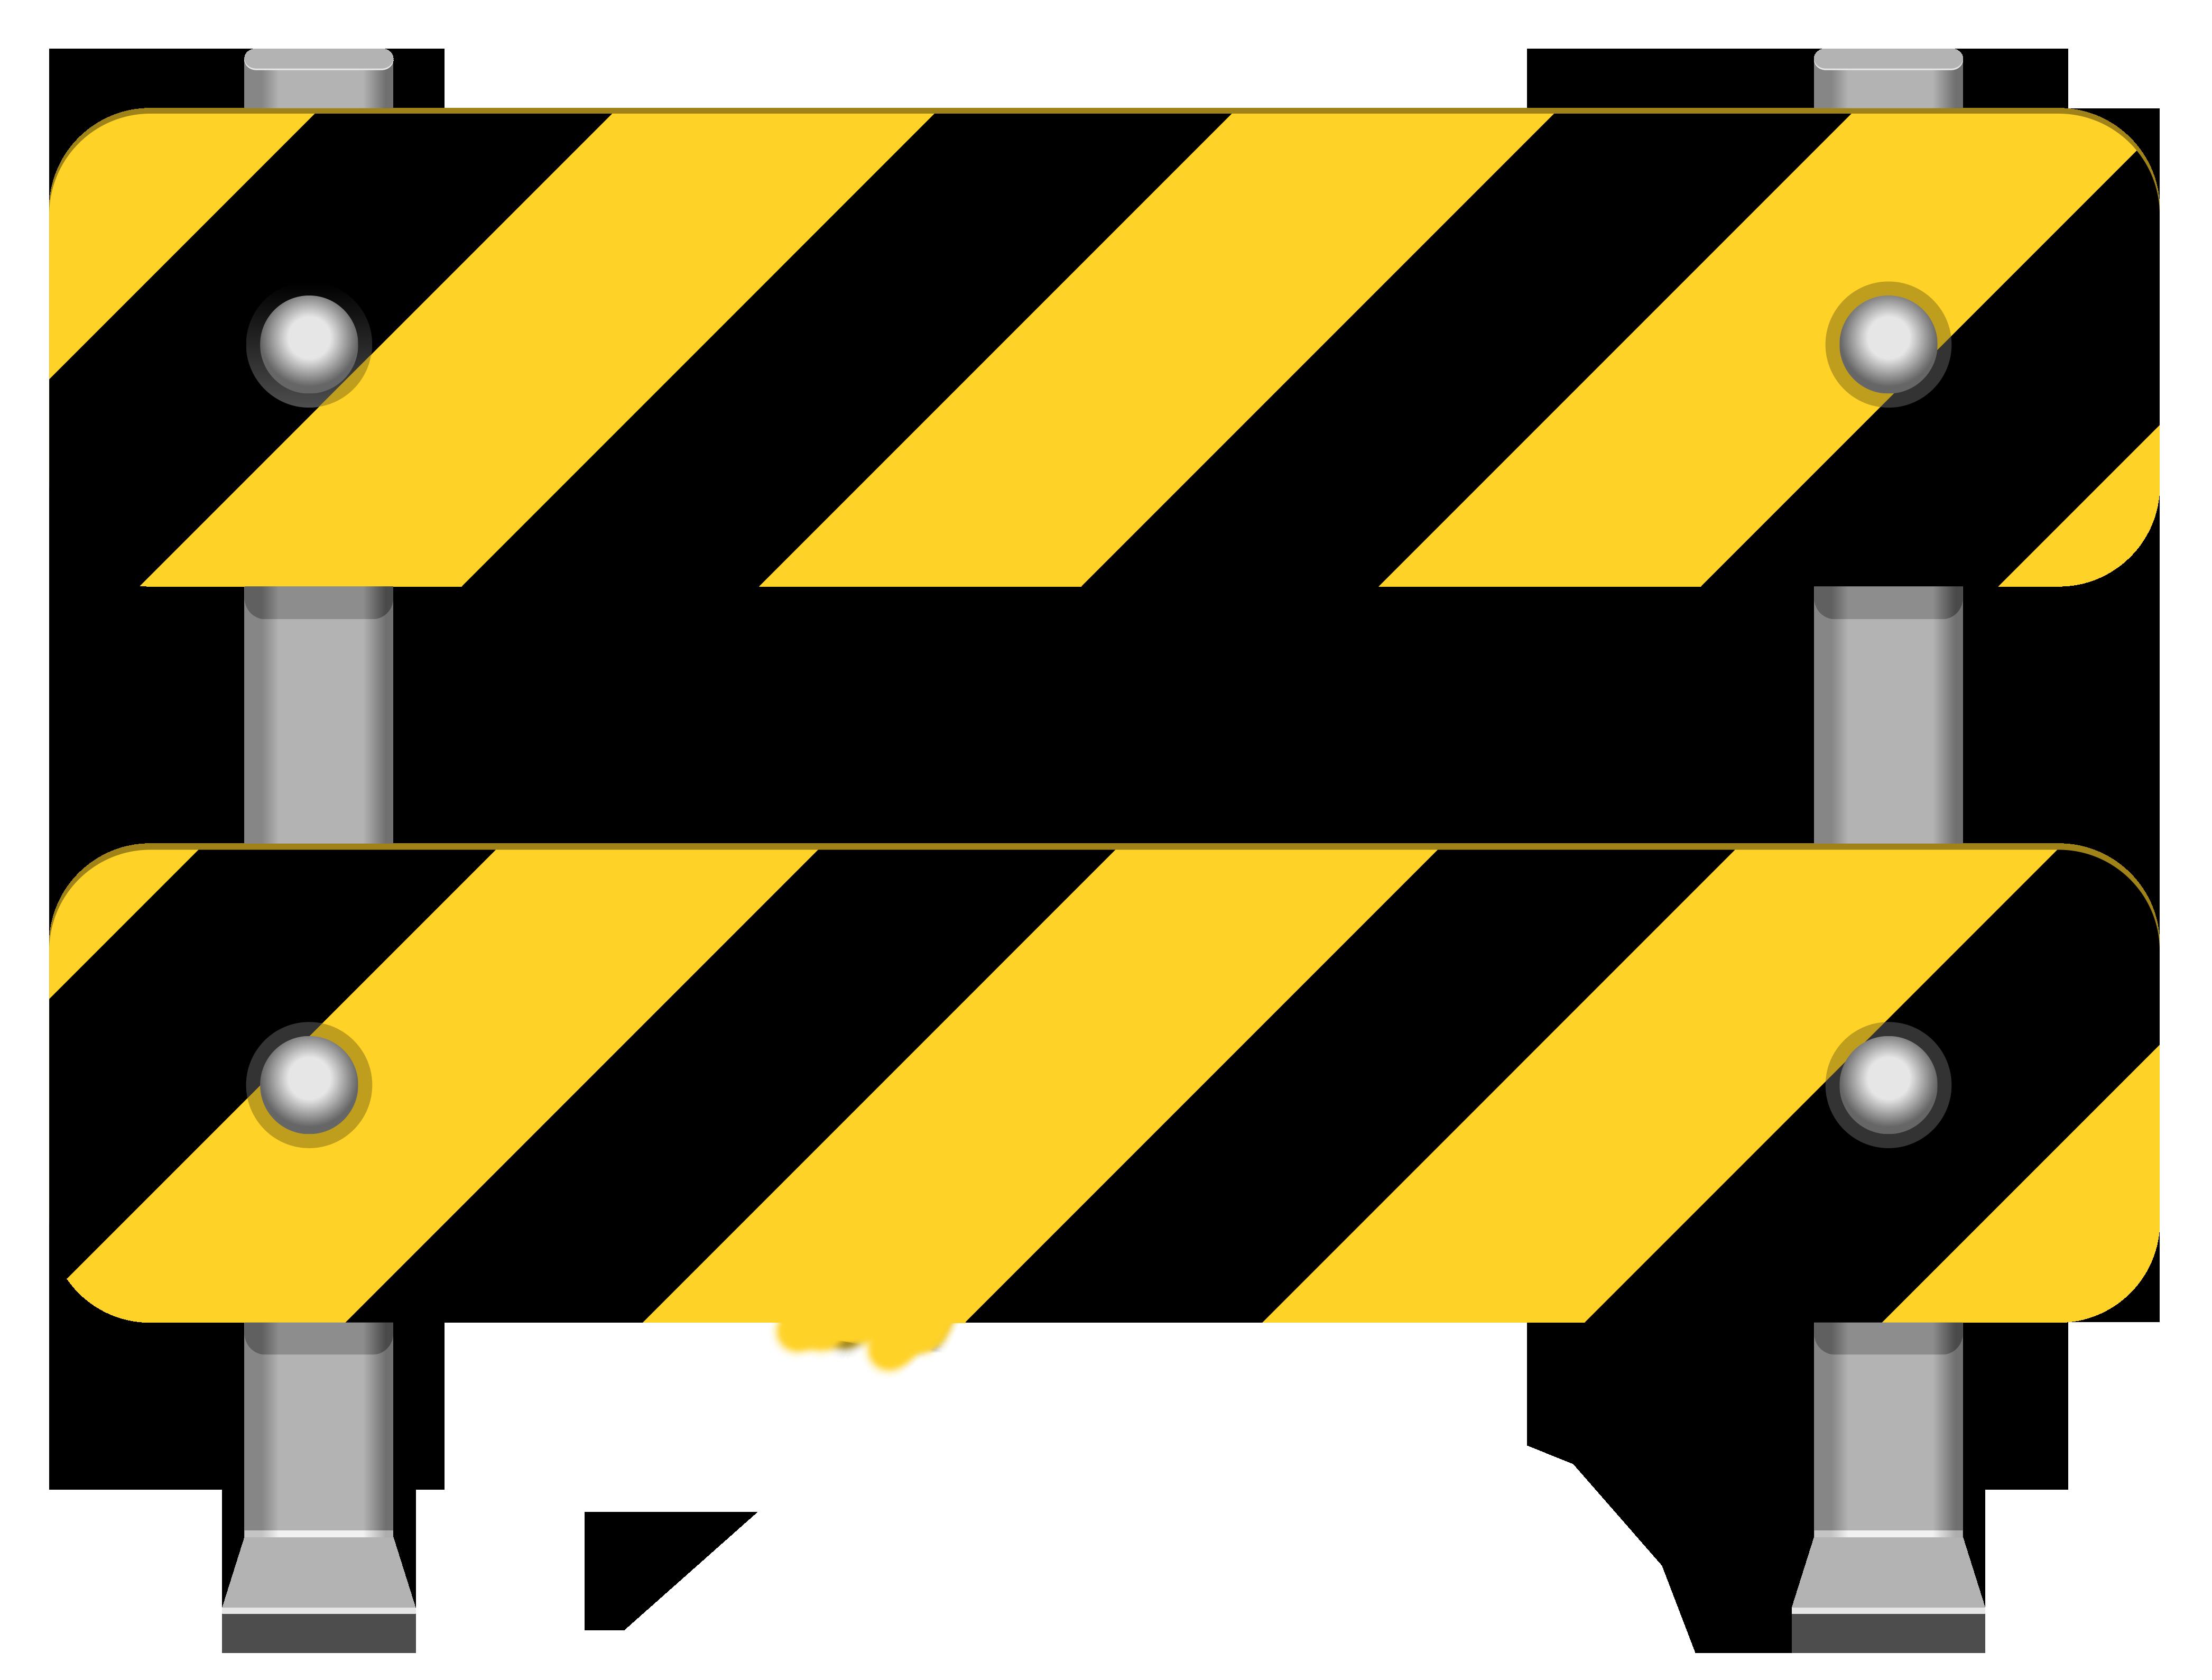 Yellow Road Barricade PNG Clip Art.